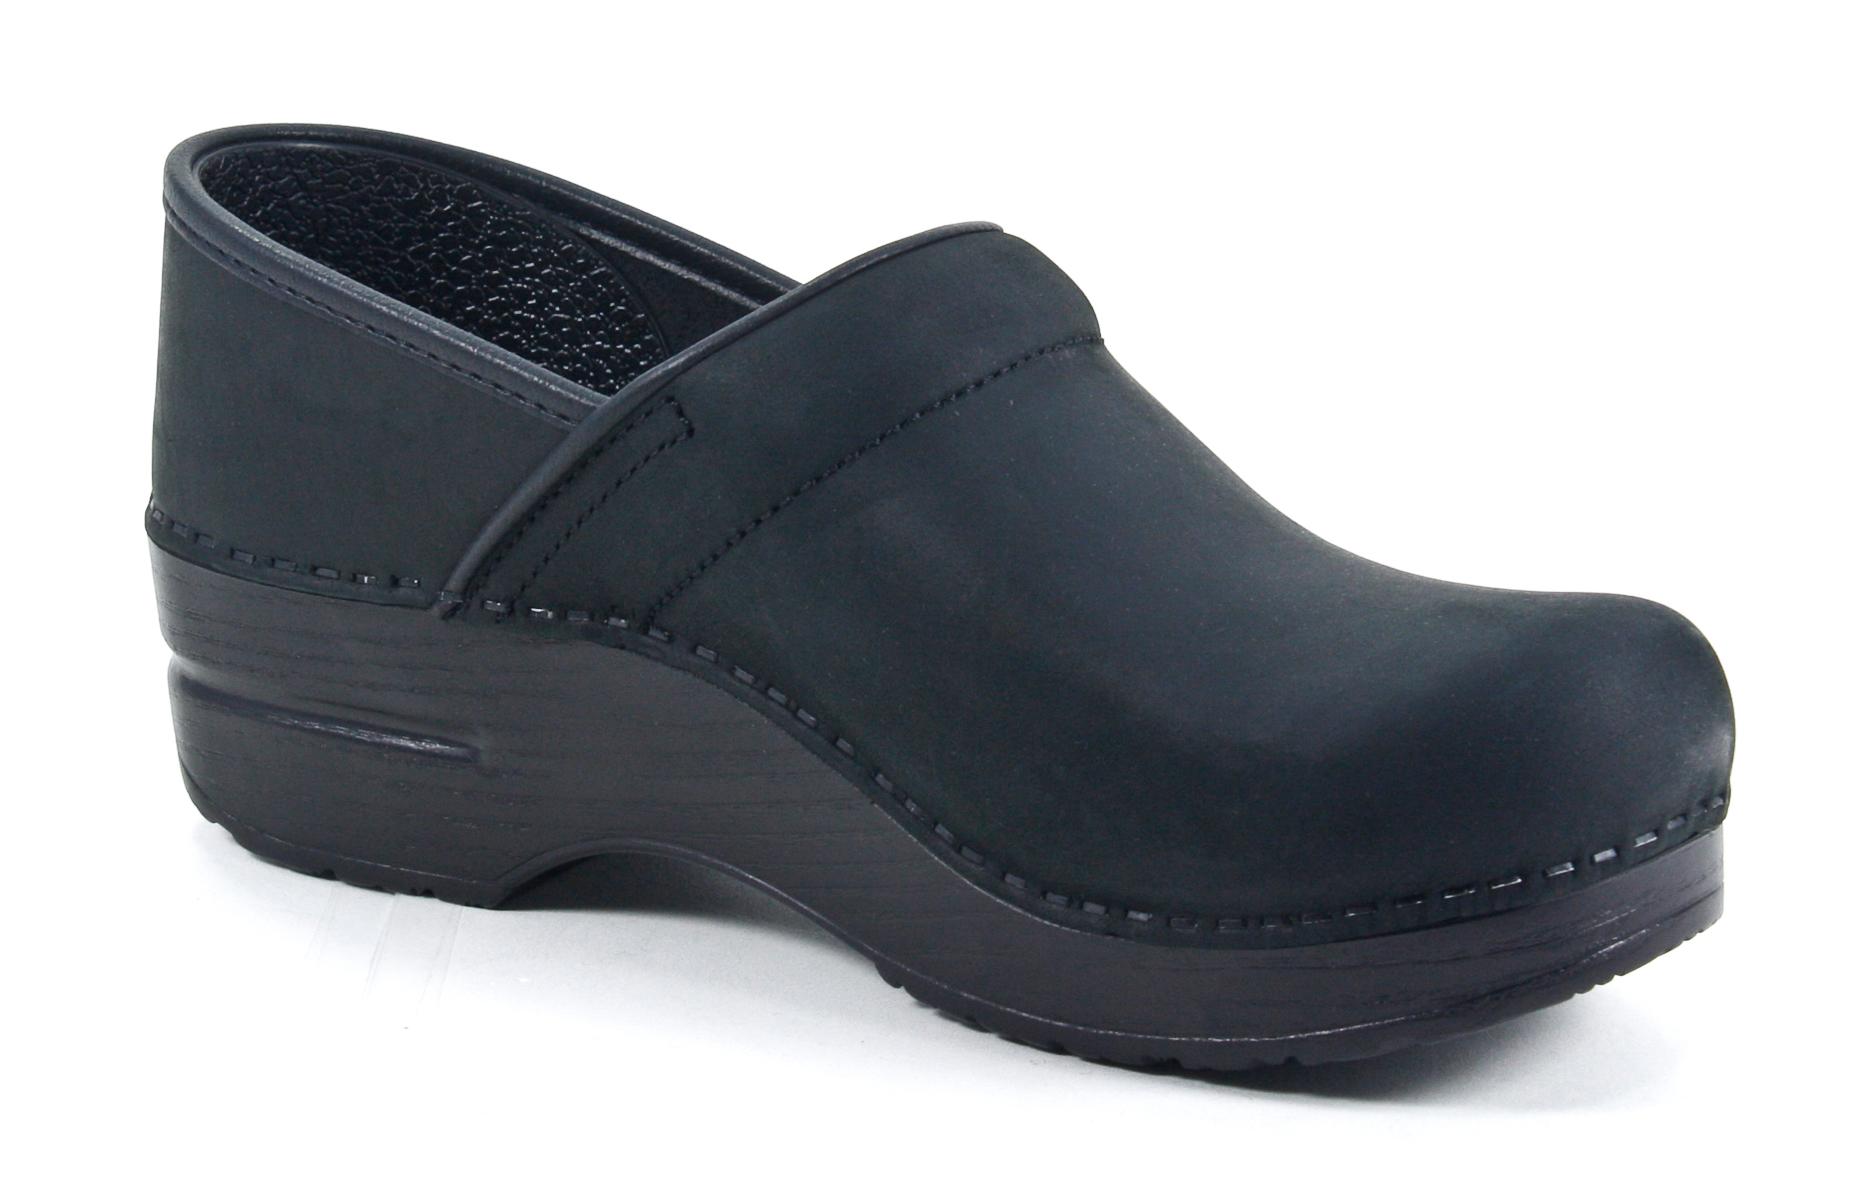 dansko professional black leather clog shoe eu 41 us